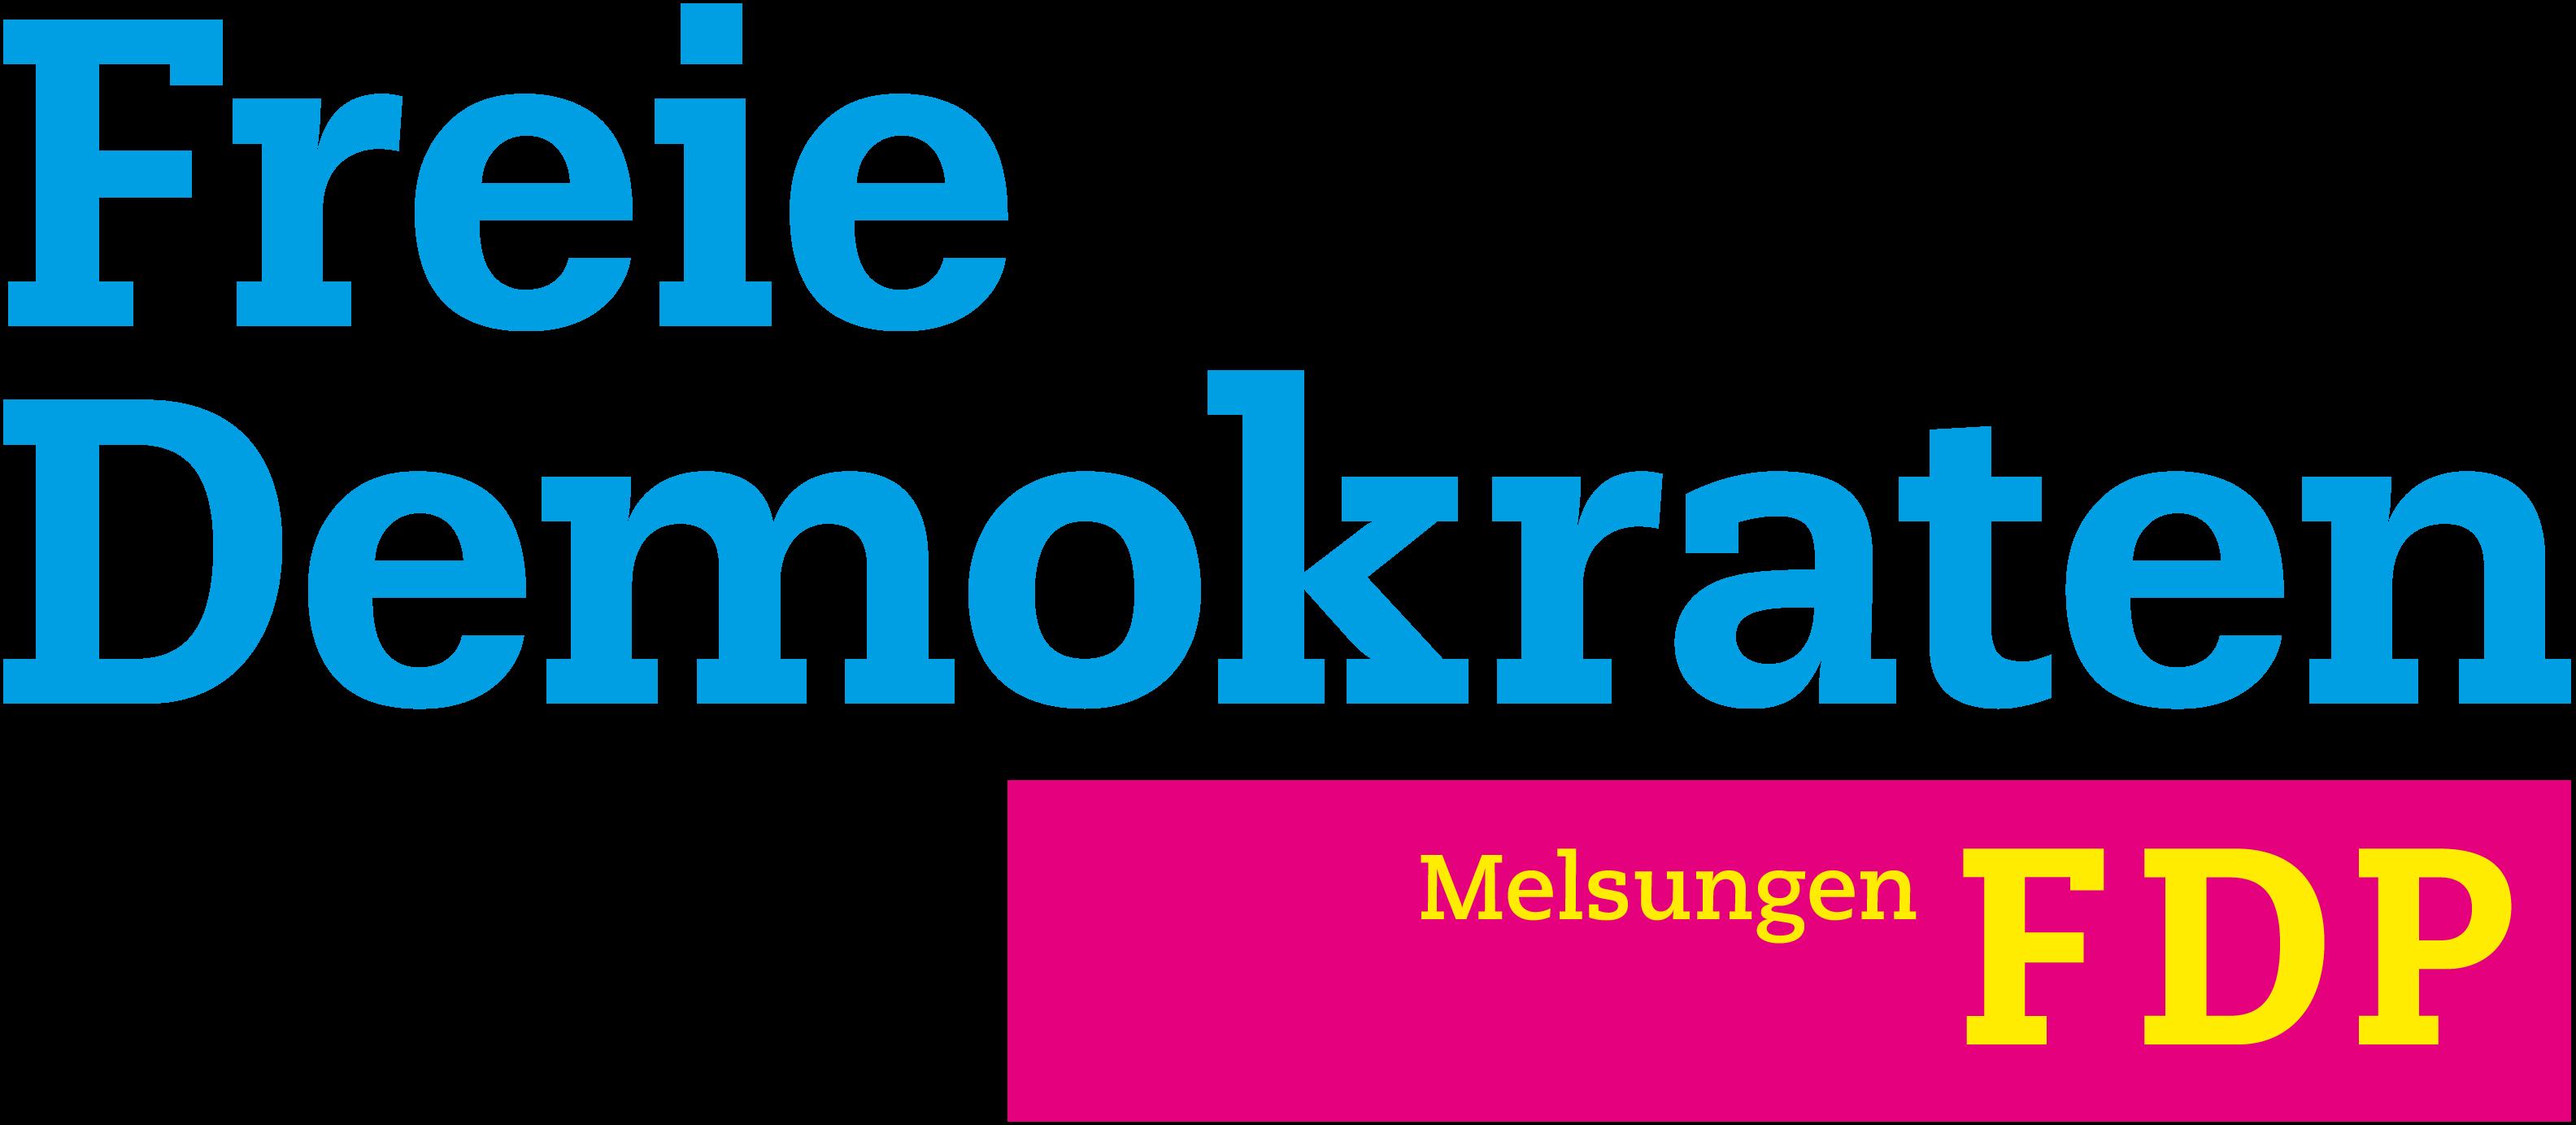 FDP Melsungen